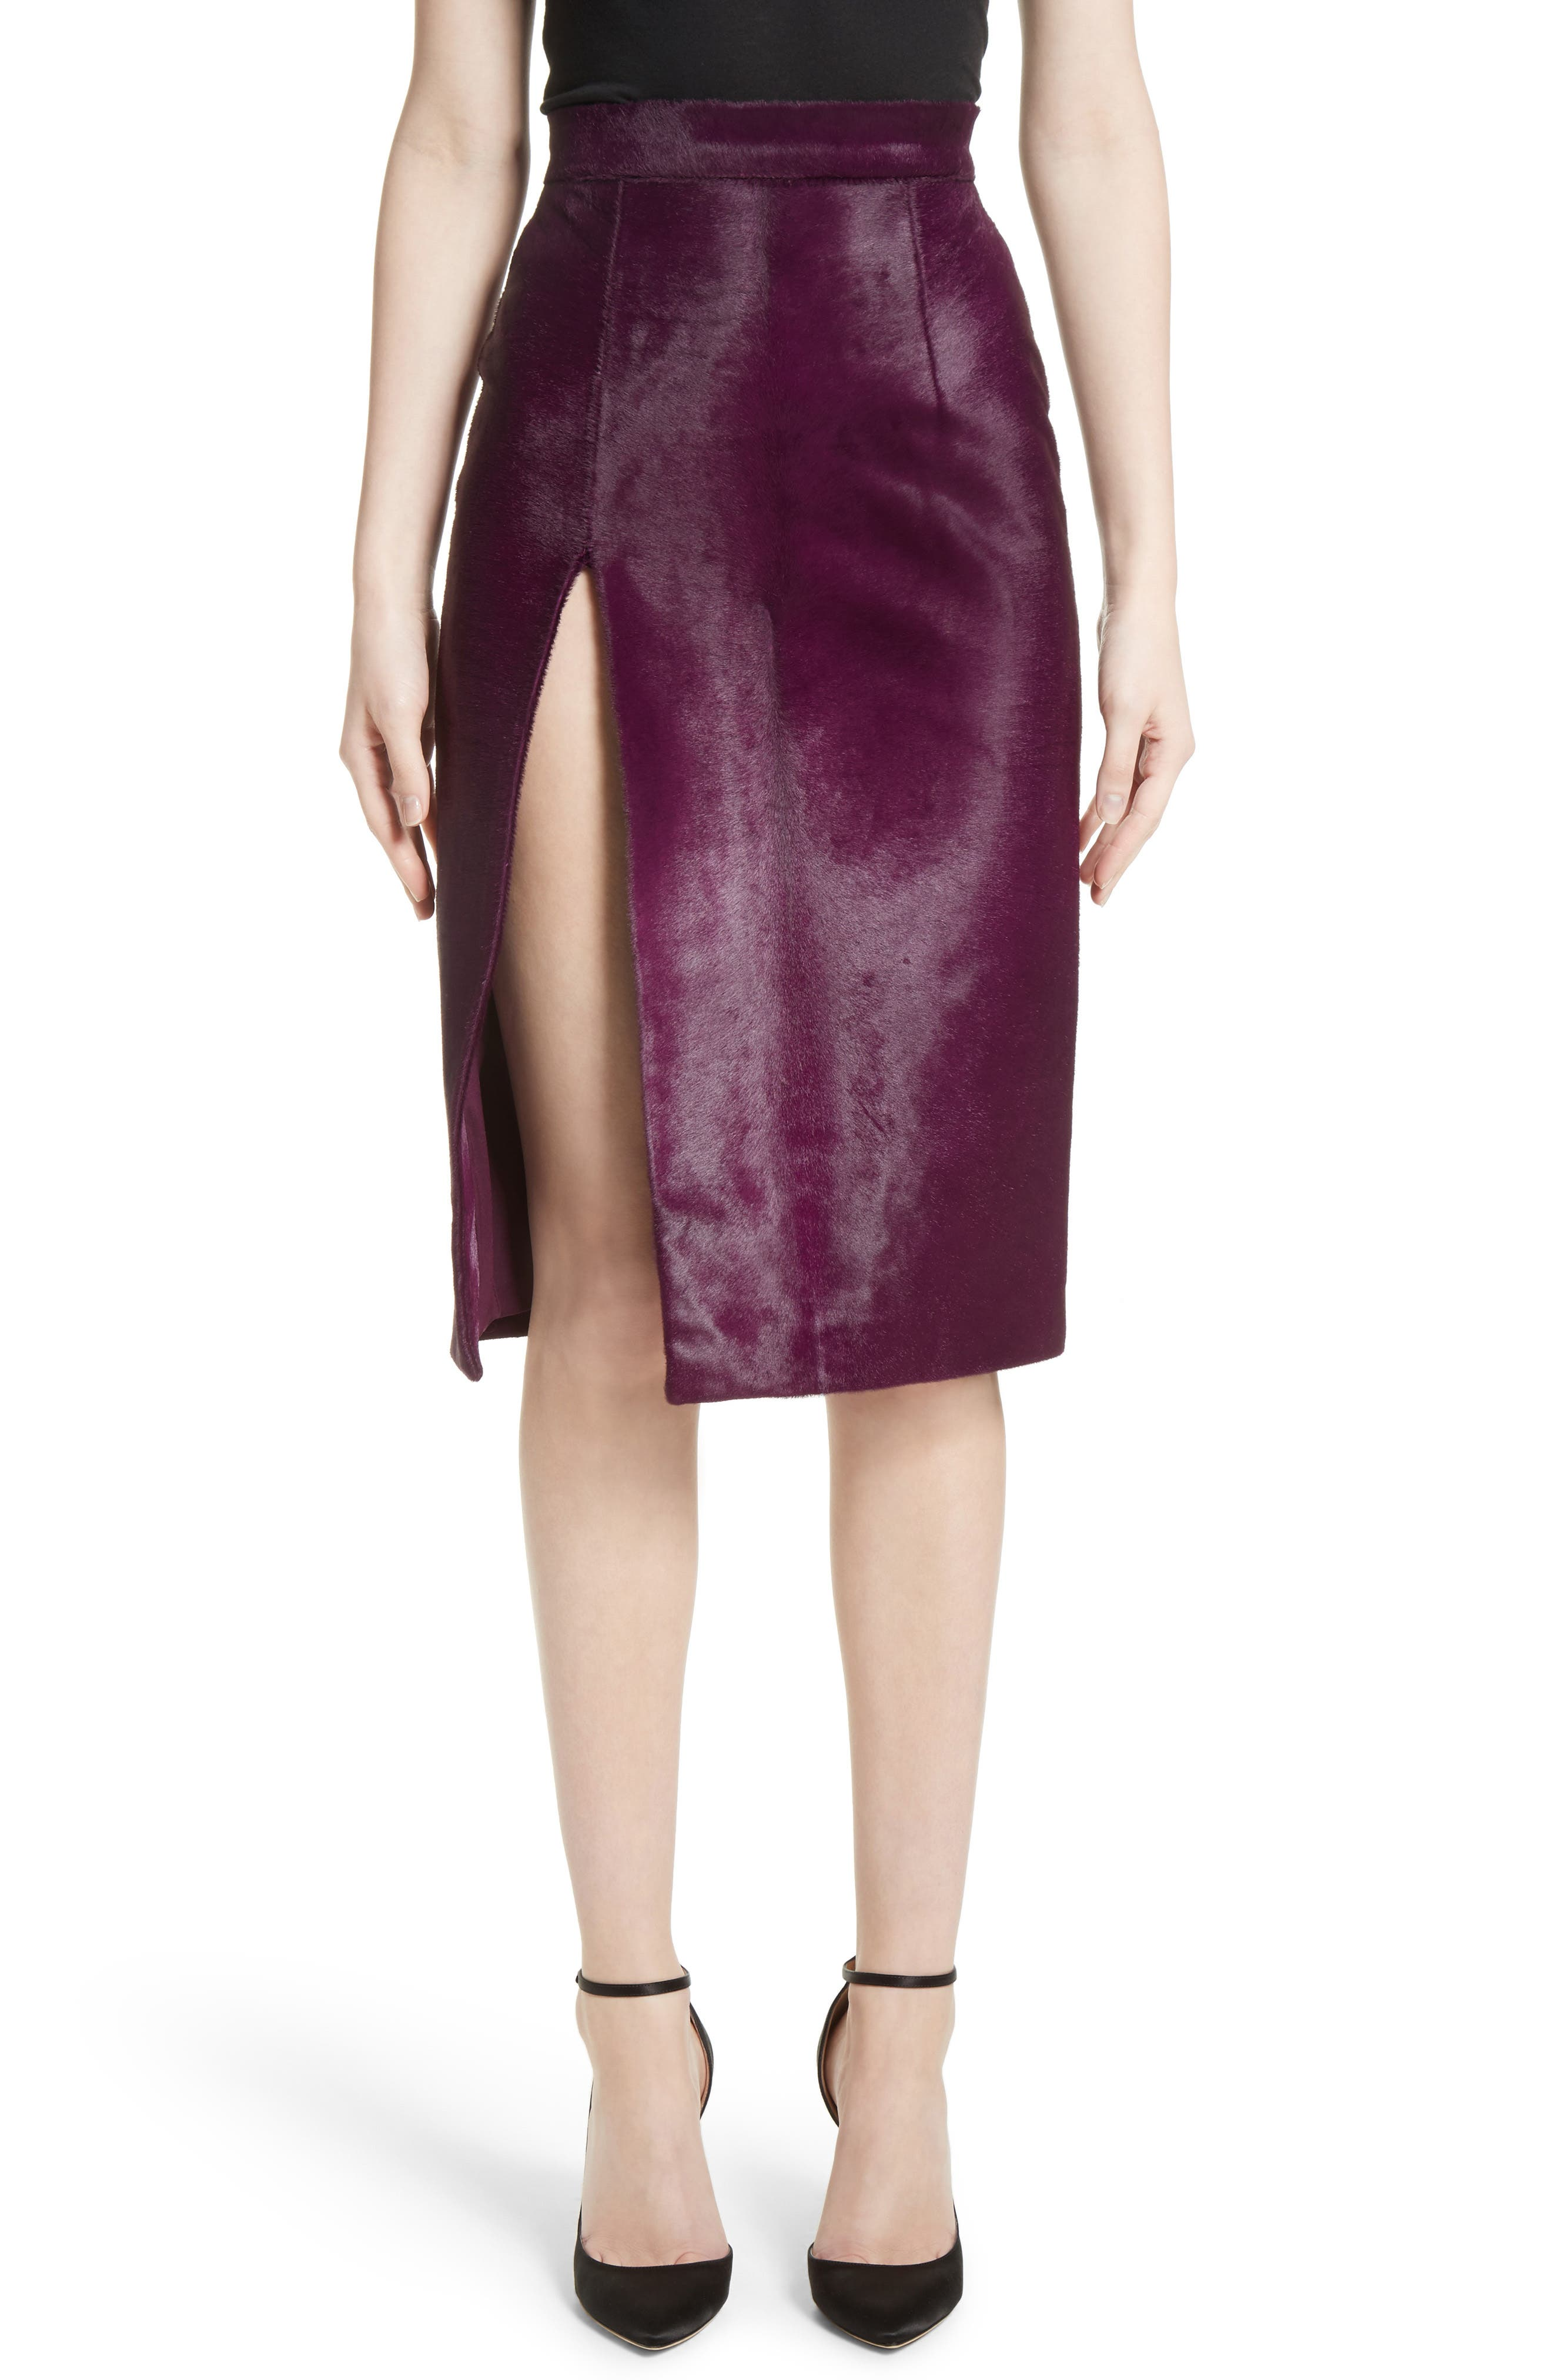 Alternate Image 1 Selected - Brandon Maxwell Genuine Calf Hair Pencil Skirt